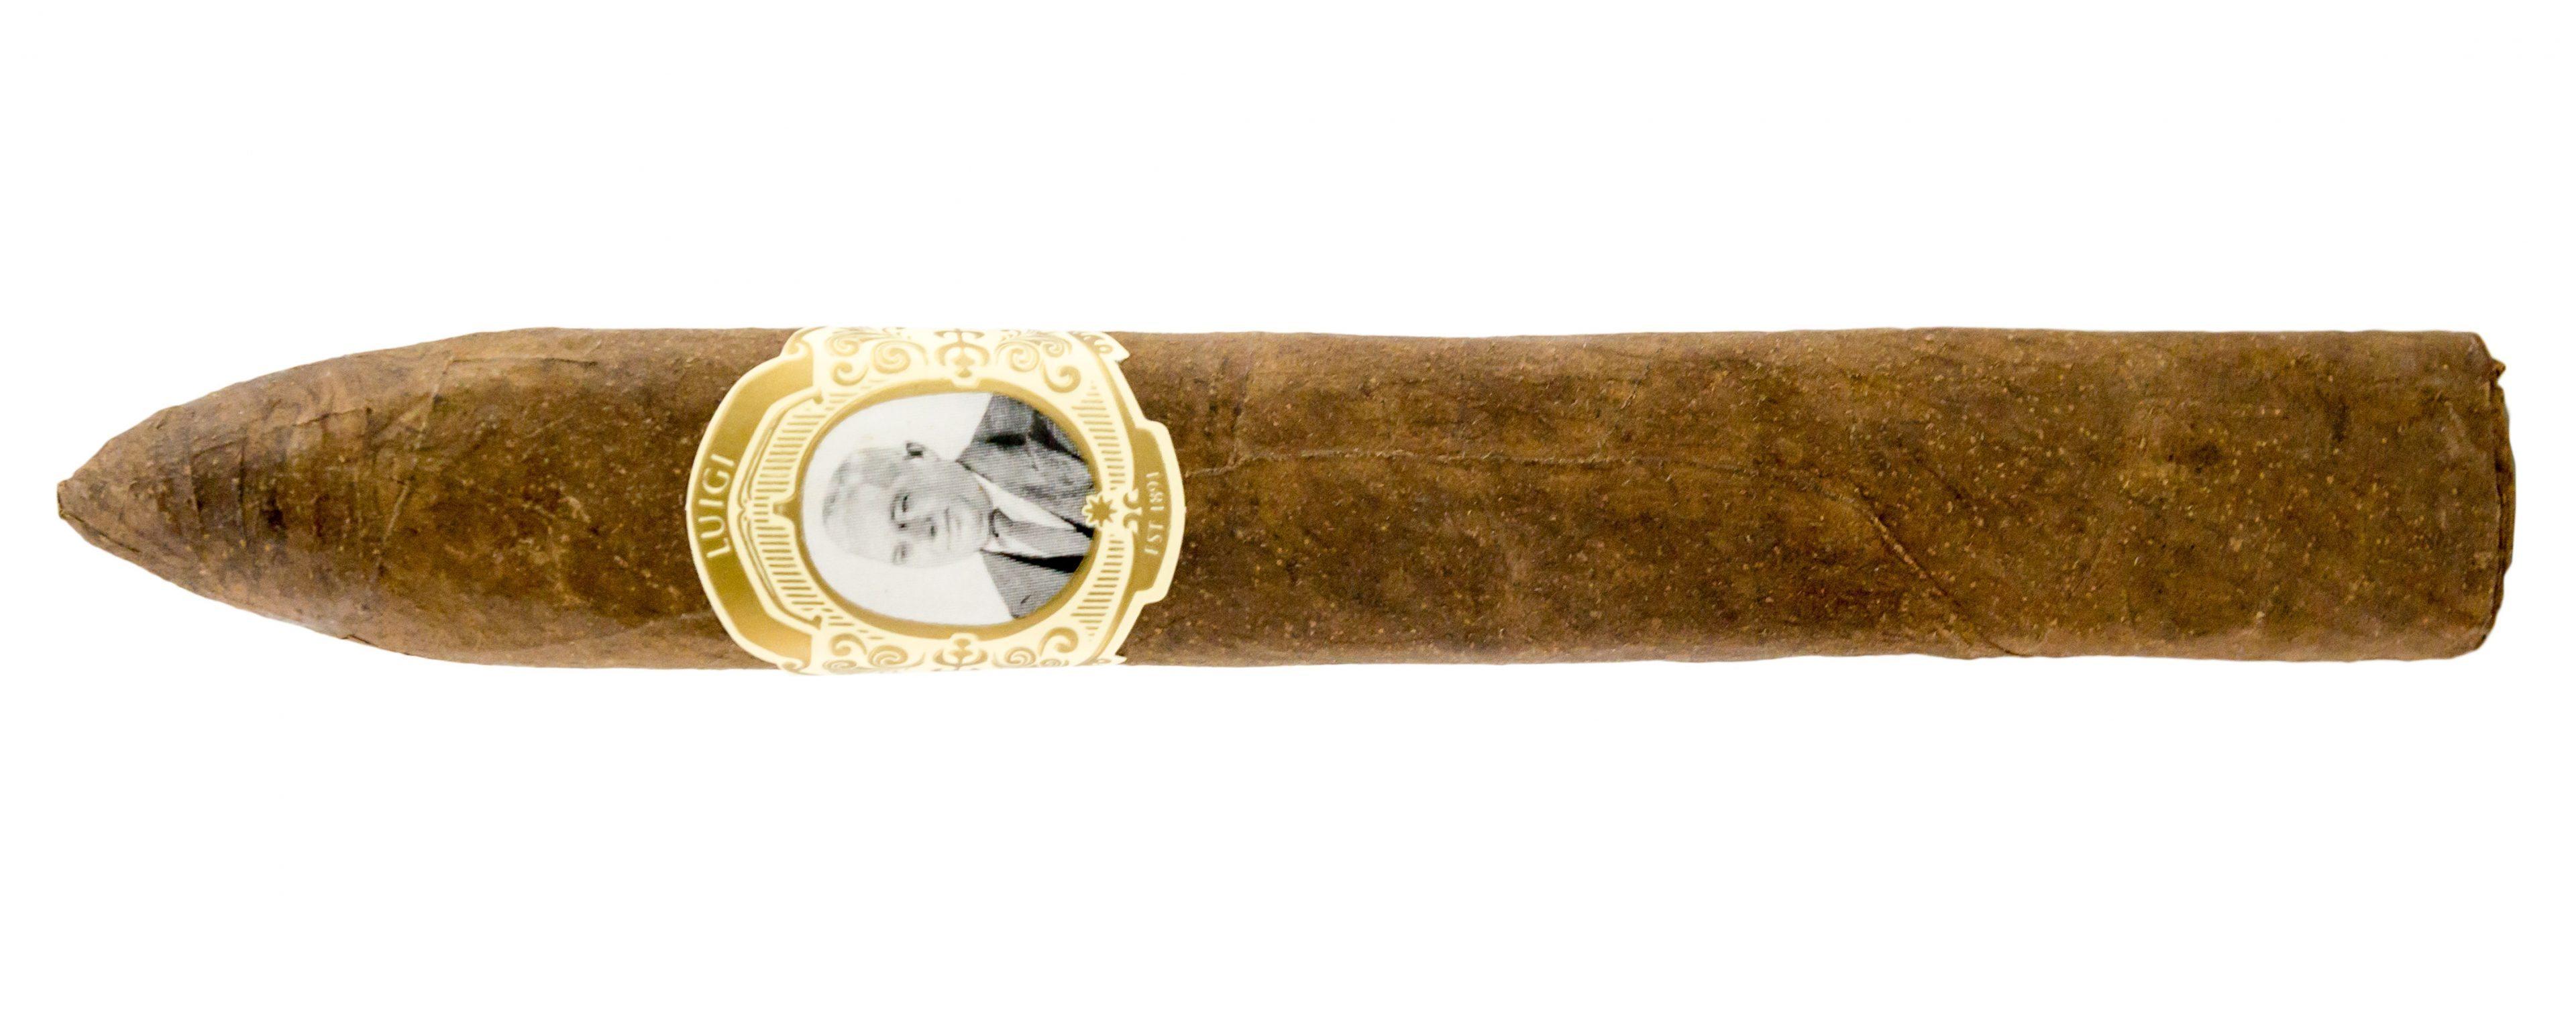 Blind Cigar Review: Vallorani | The Luigi Torpedo